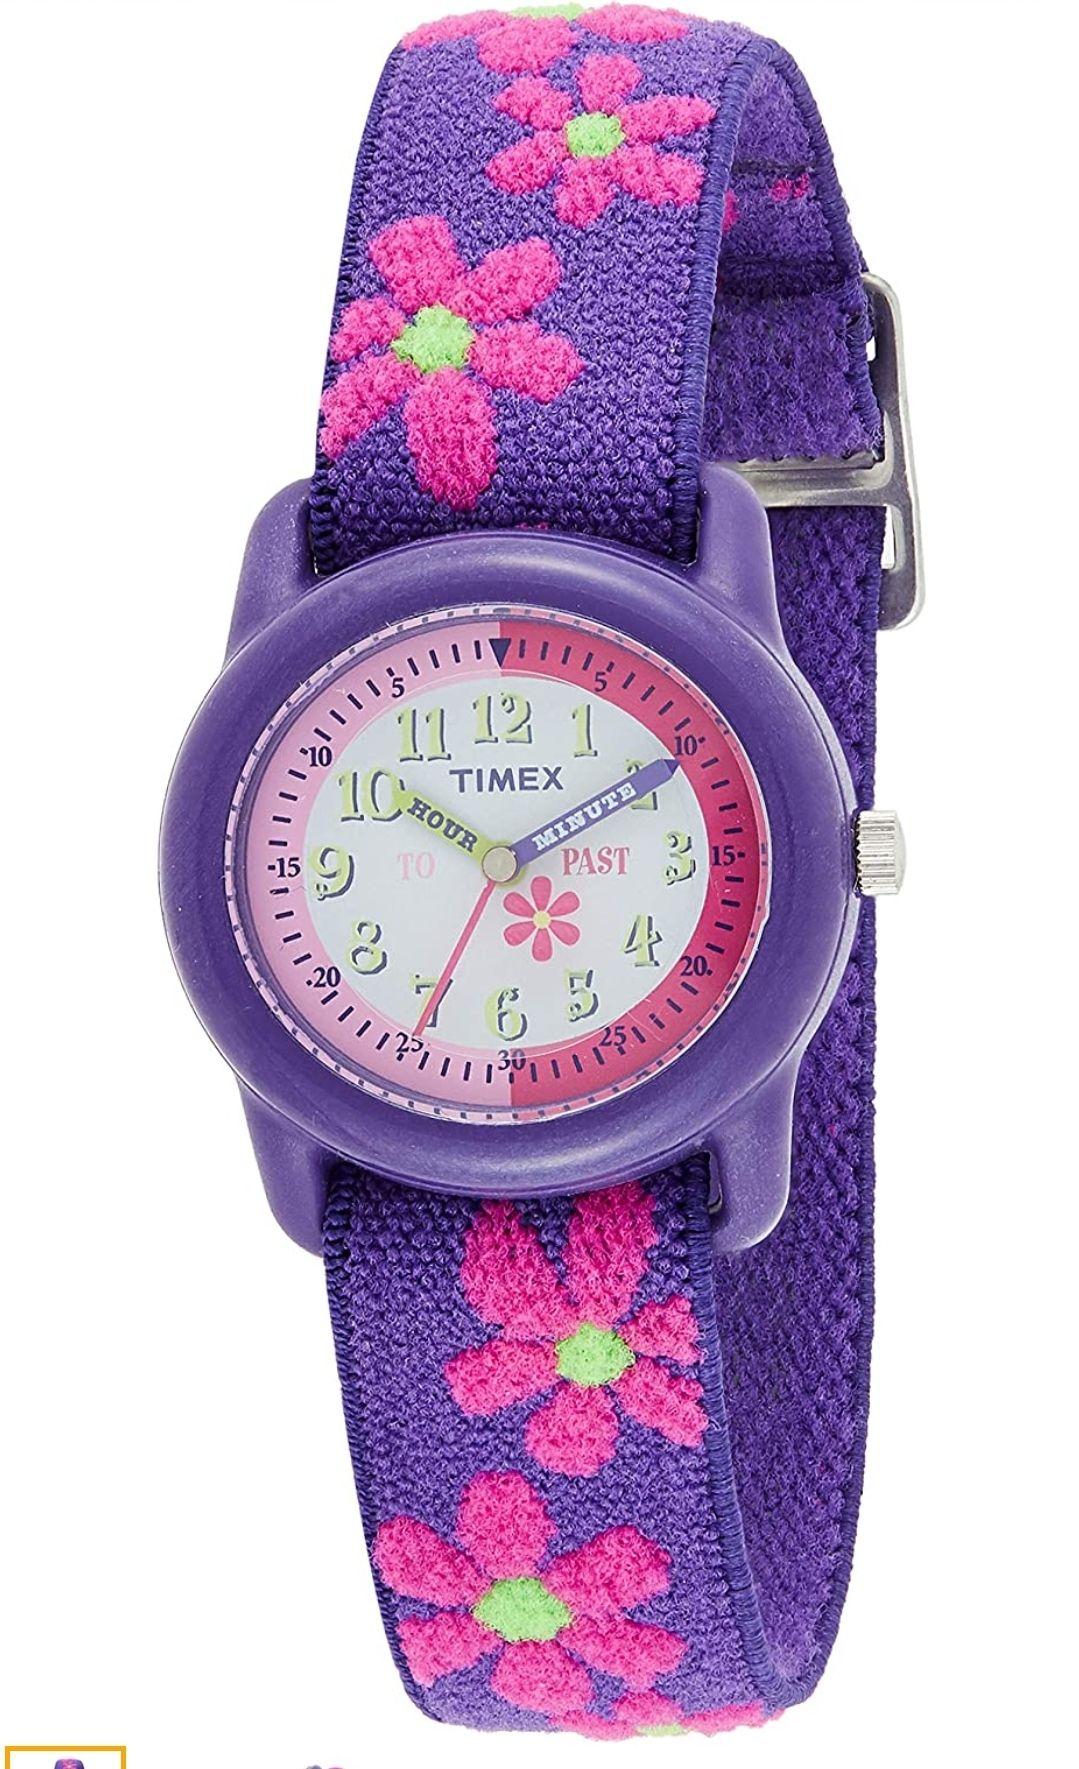 Timex Kid's Analog 28 mm Elastic Fabric Strap Watch £12.99 + £4.49 Non Prime @ Amazon